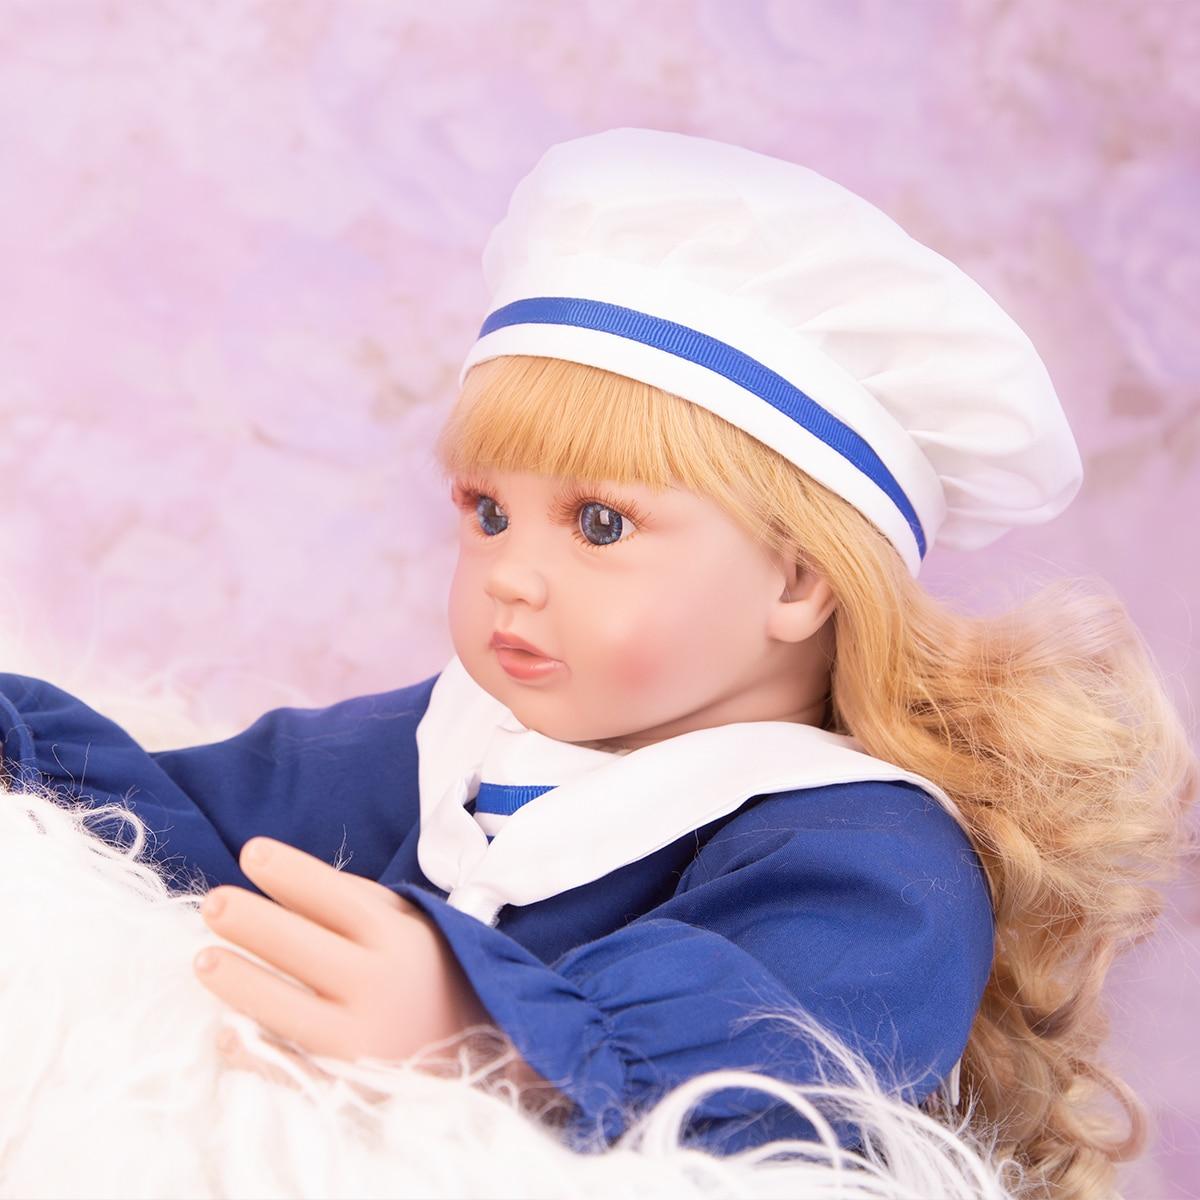 кукла-младенец keiumi 24d150-c622-s11-t52